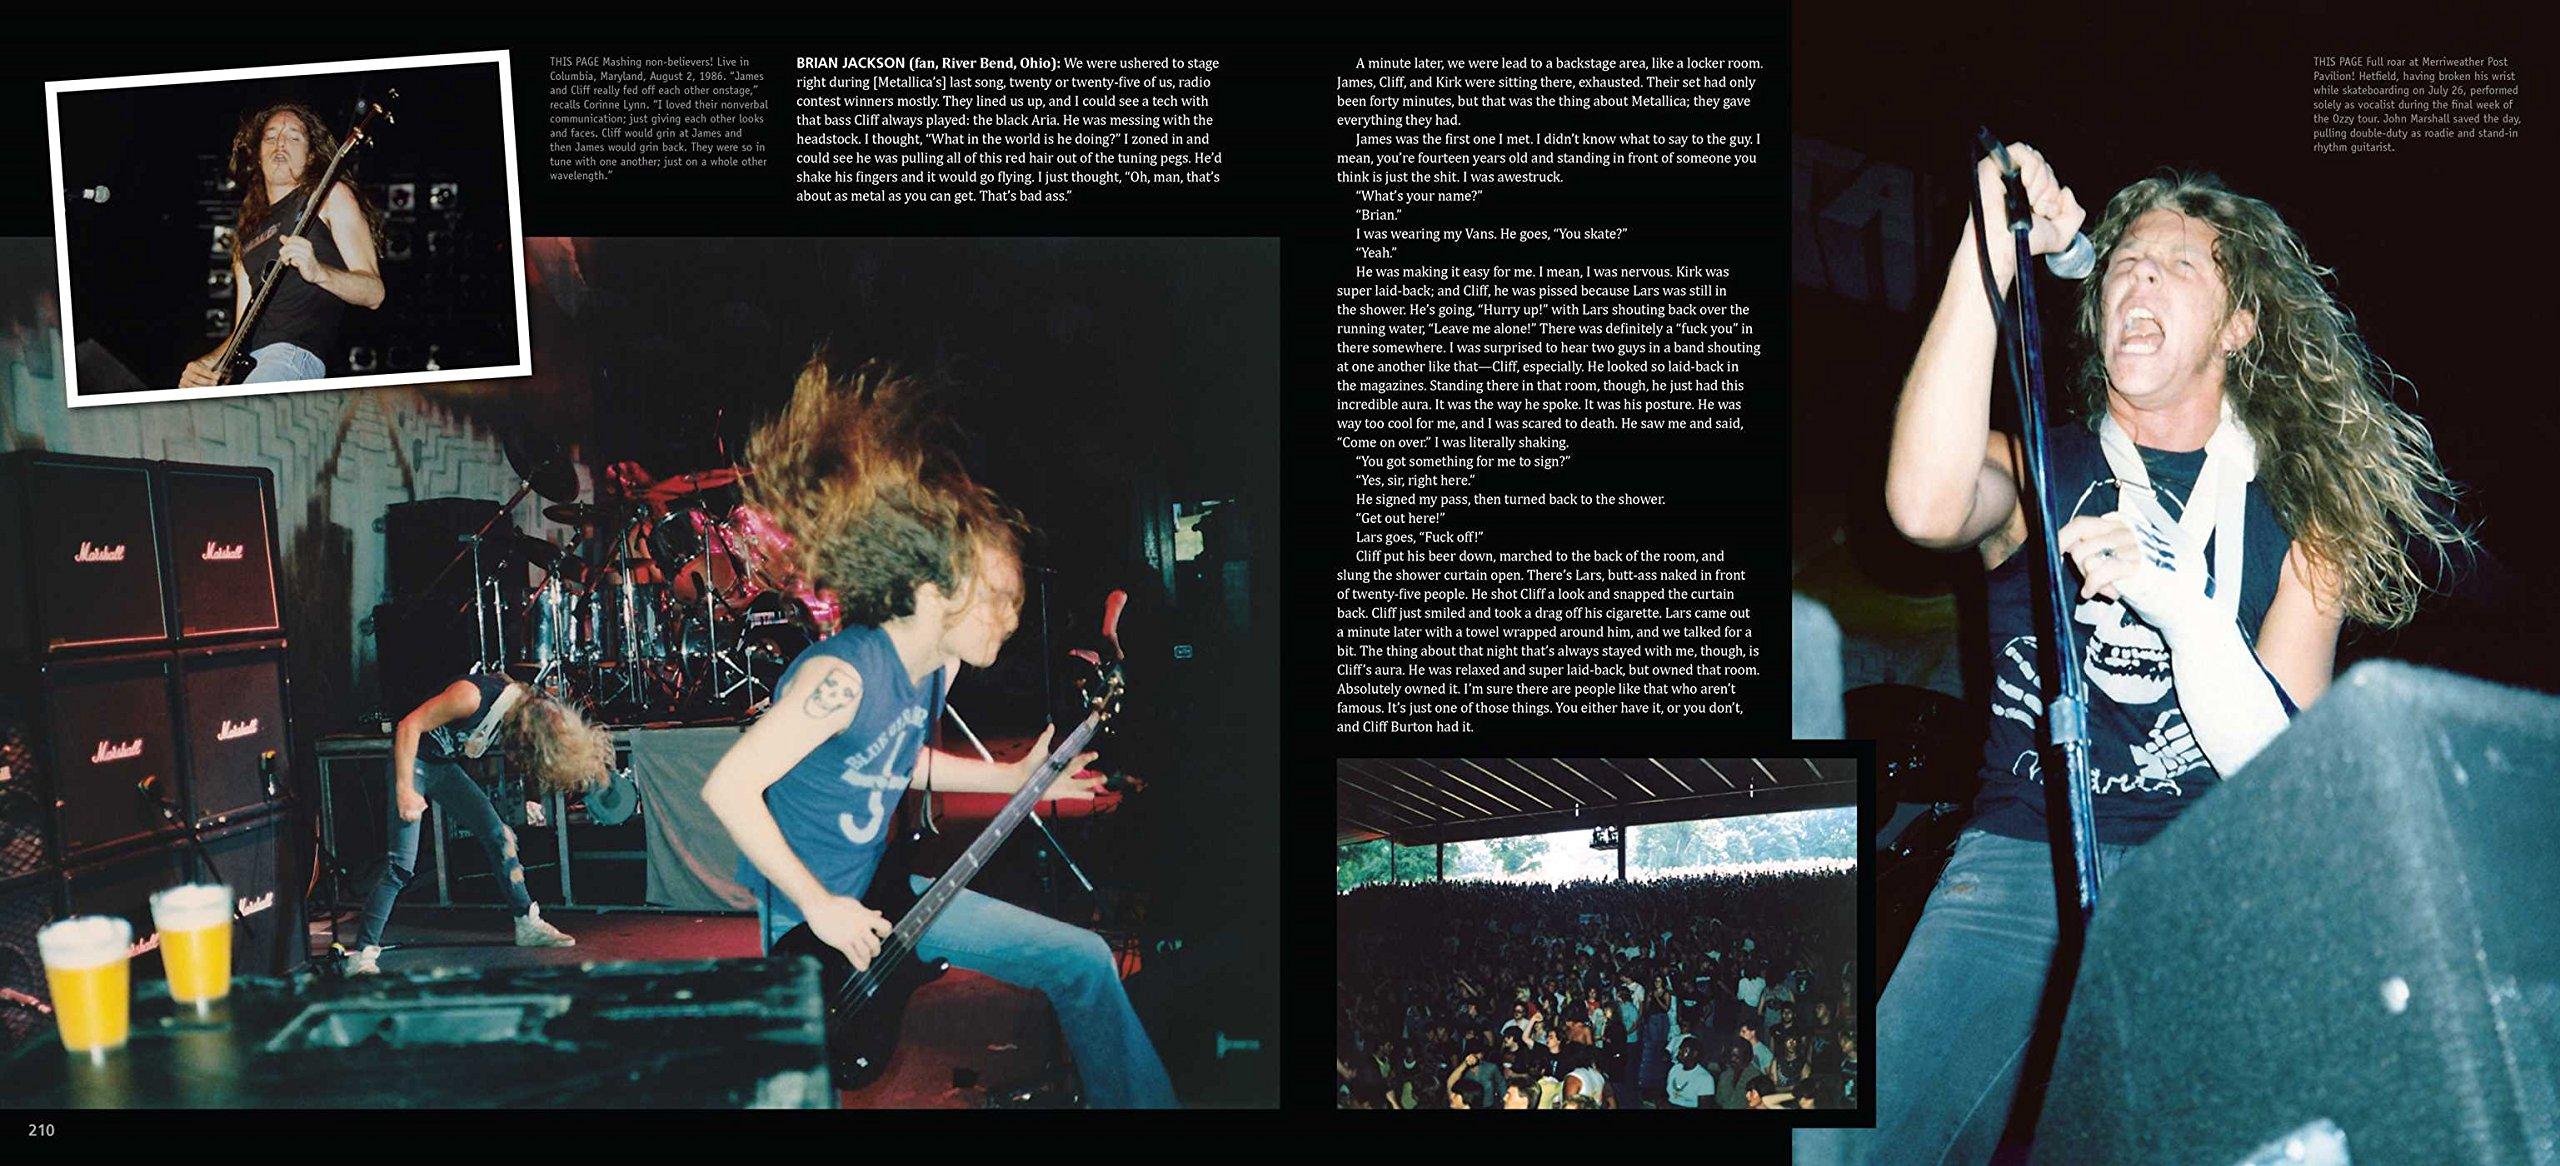 Literatura rock - Página 27 91t1qEgoowL